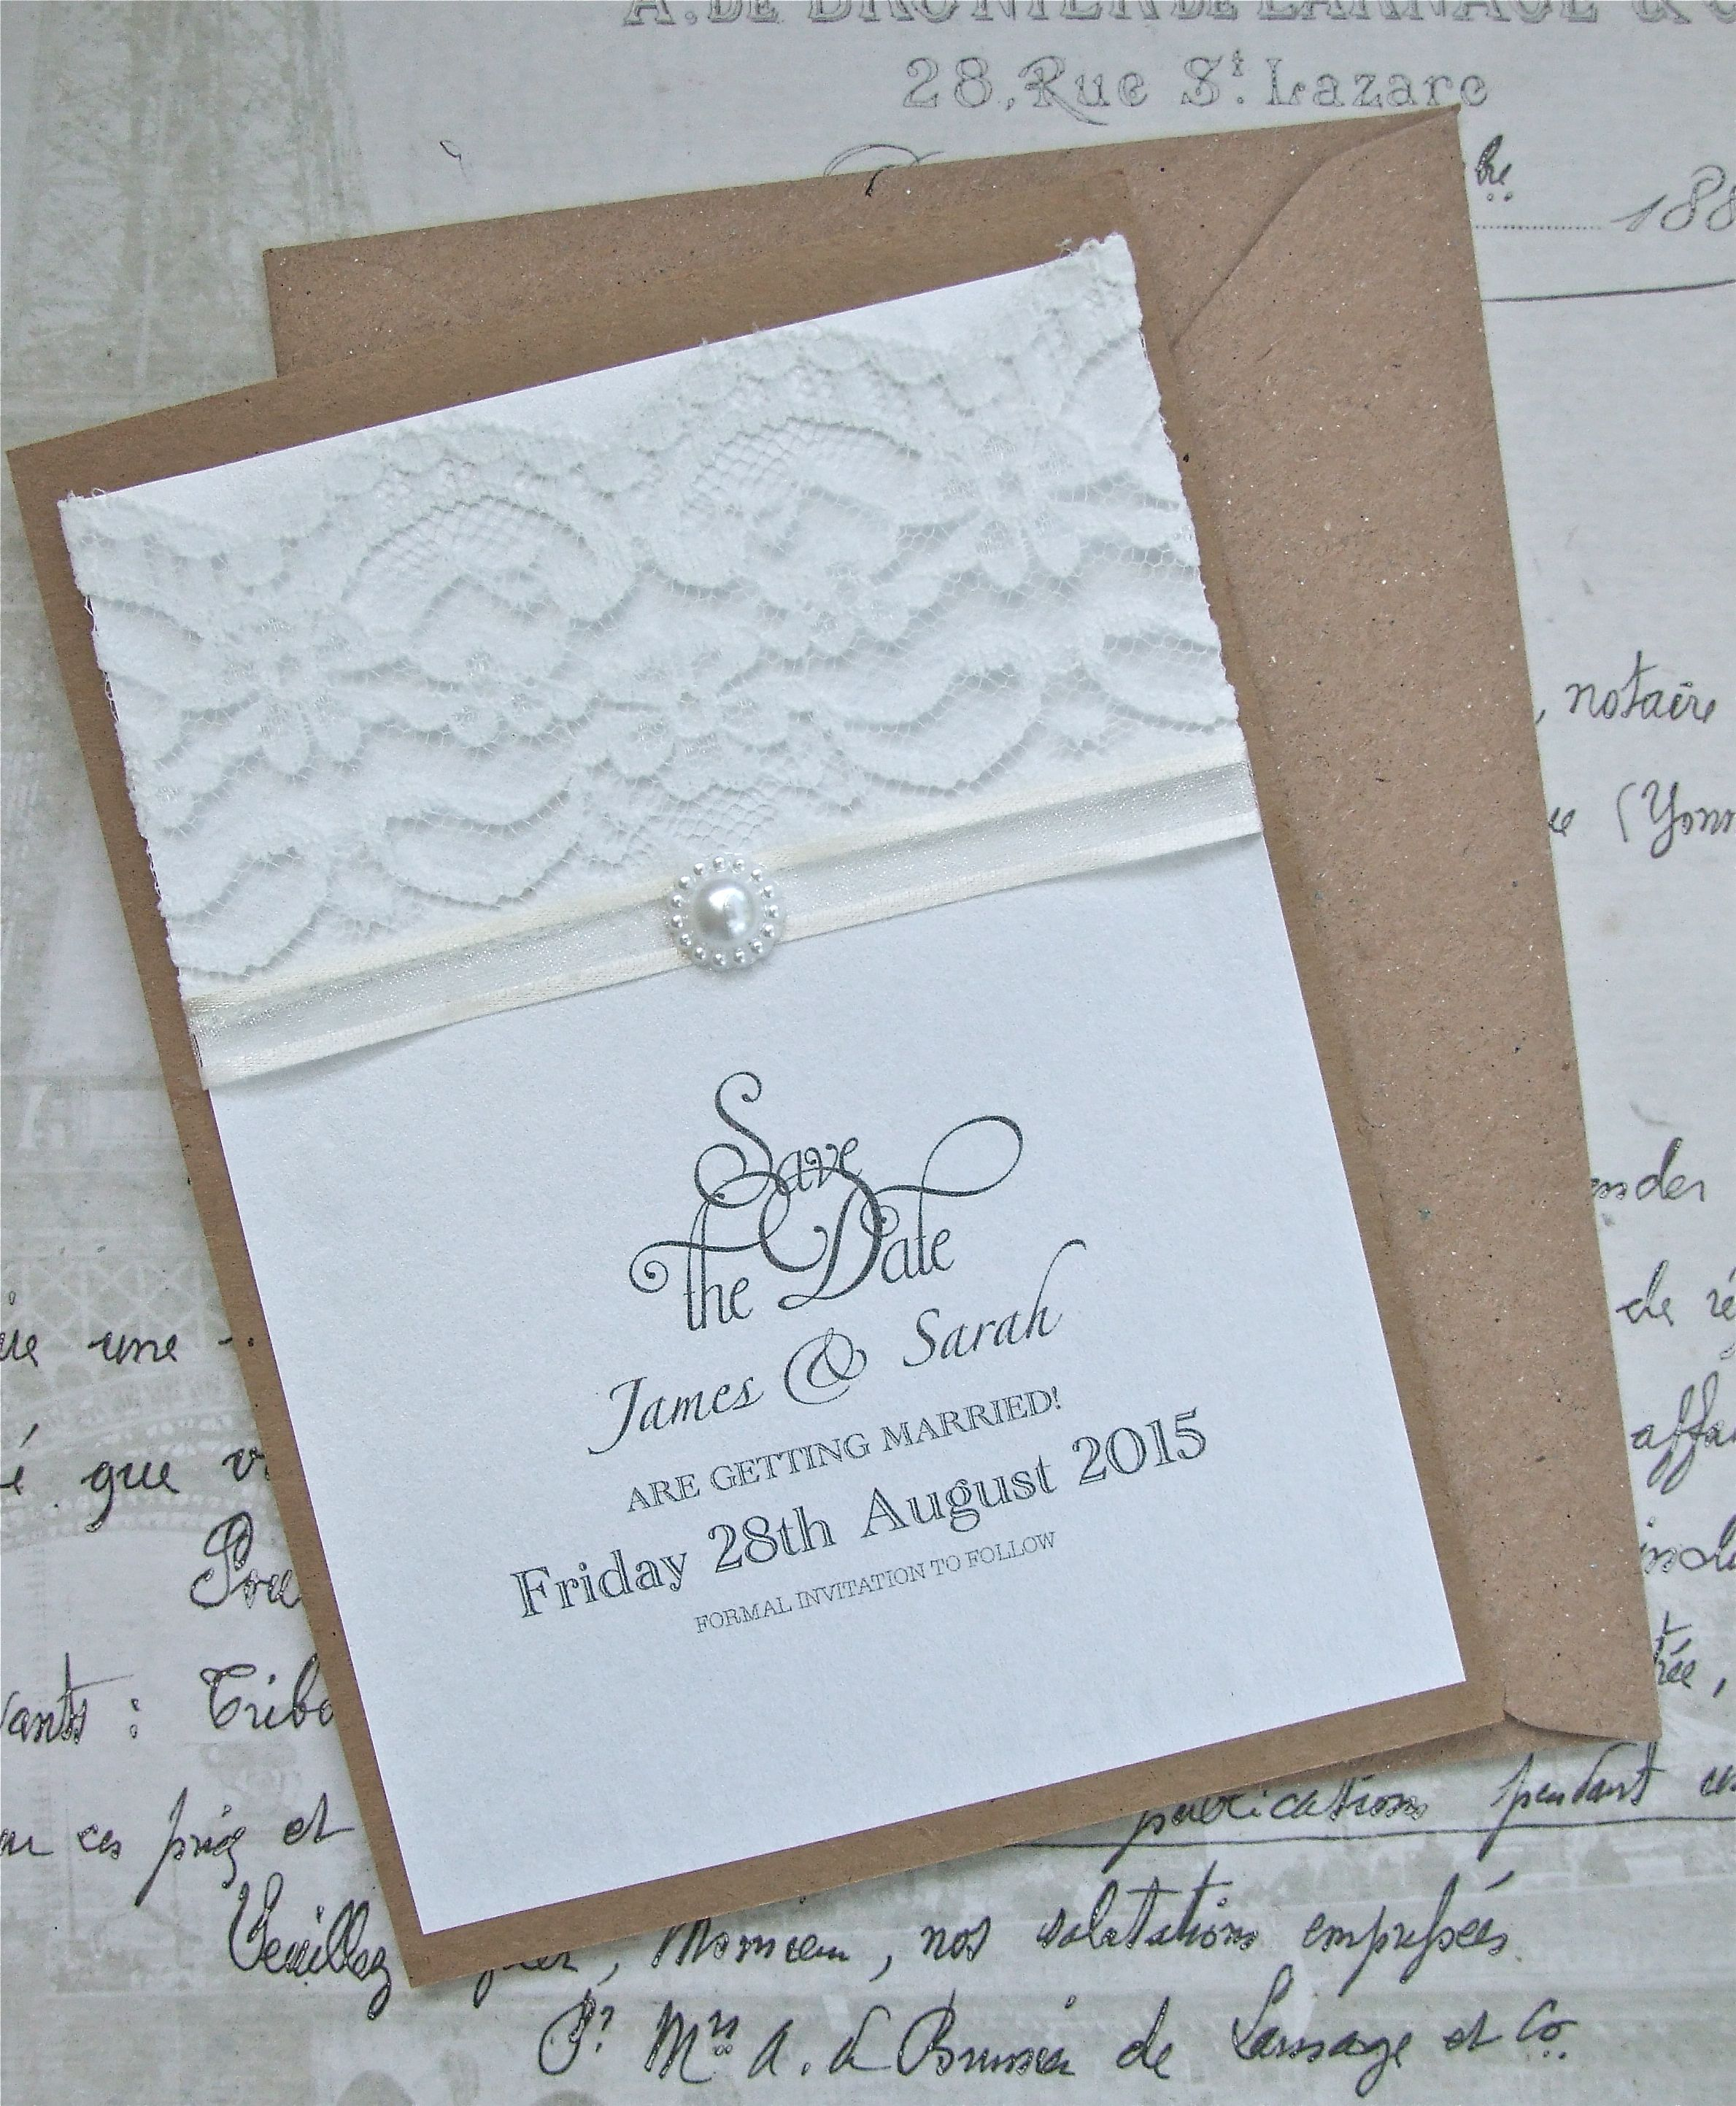 Bridal shower invitation Vintage garden party theme Paper doily – Engagement Party Invitations Uk